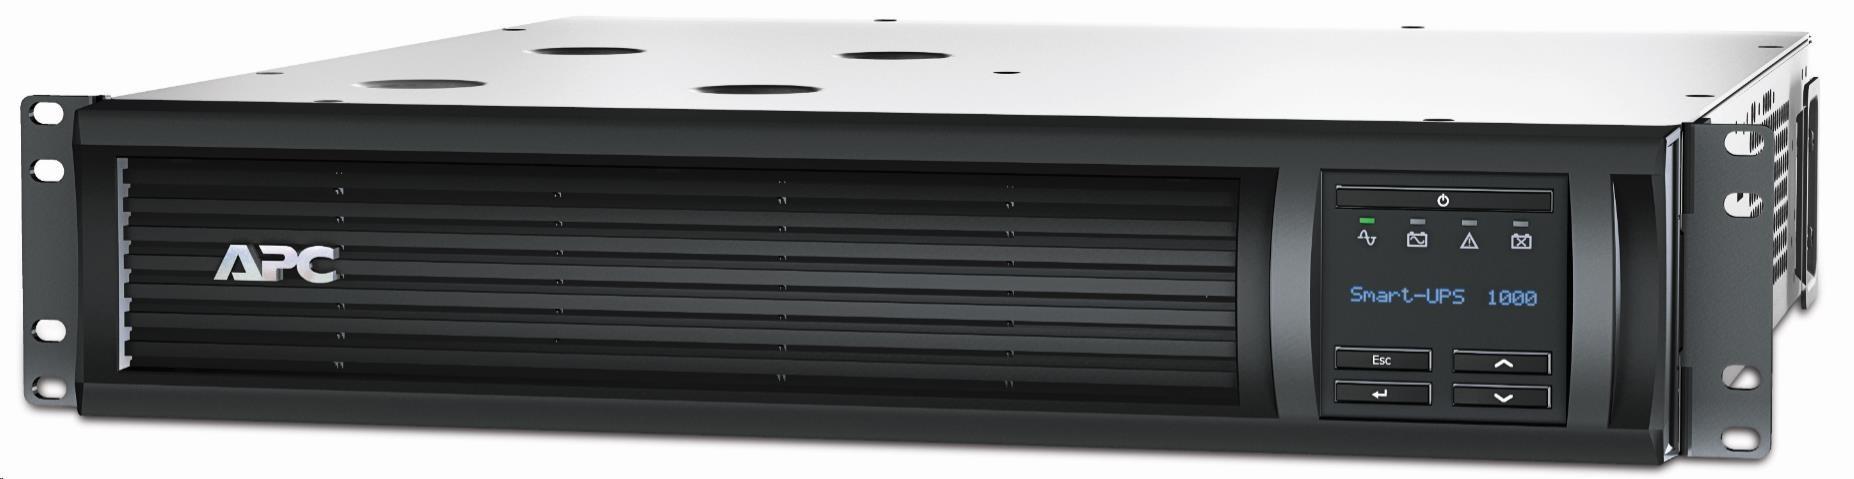 APC Smart-UPS 1000VA LCD RM 2U 230V with SmartConnect (700W)